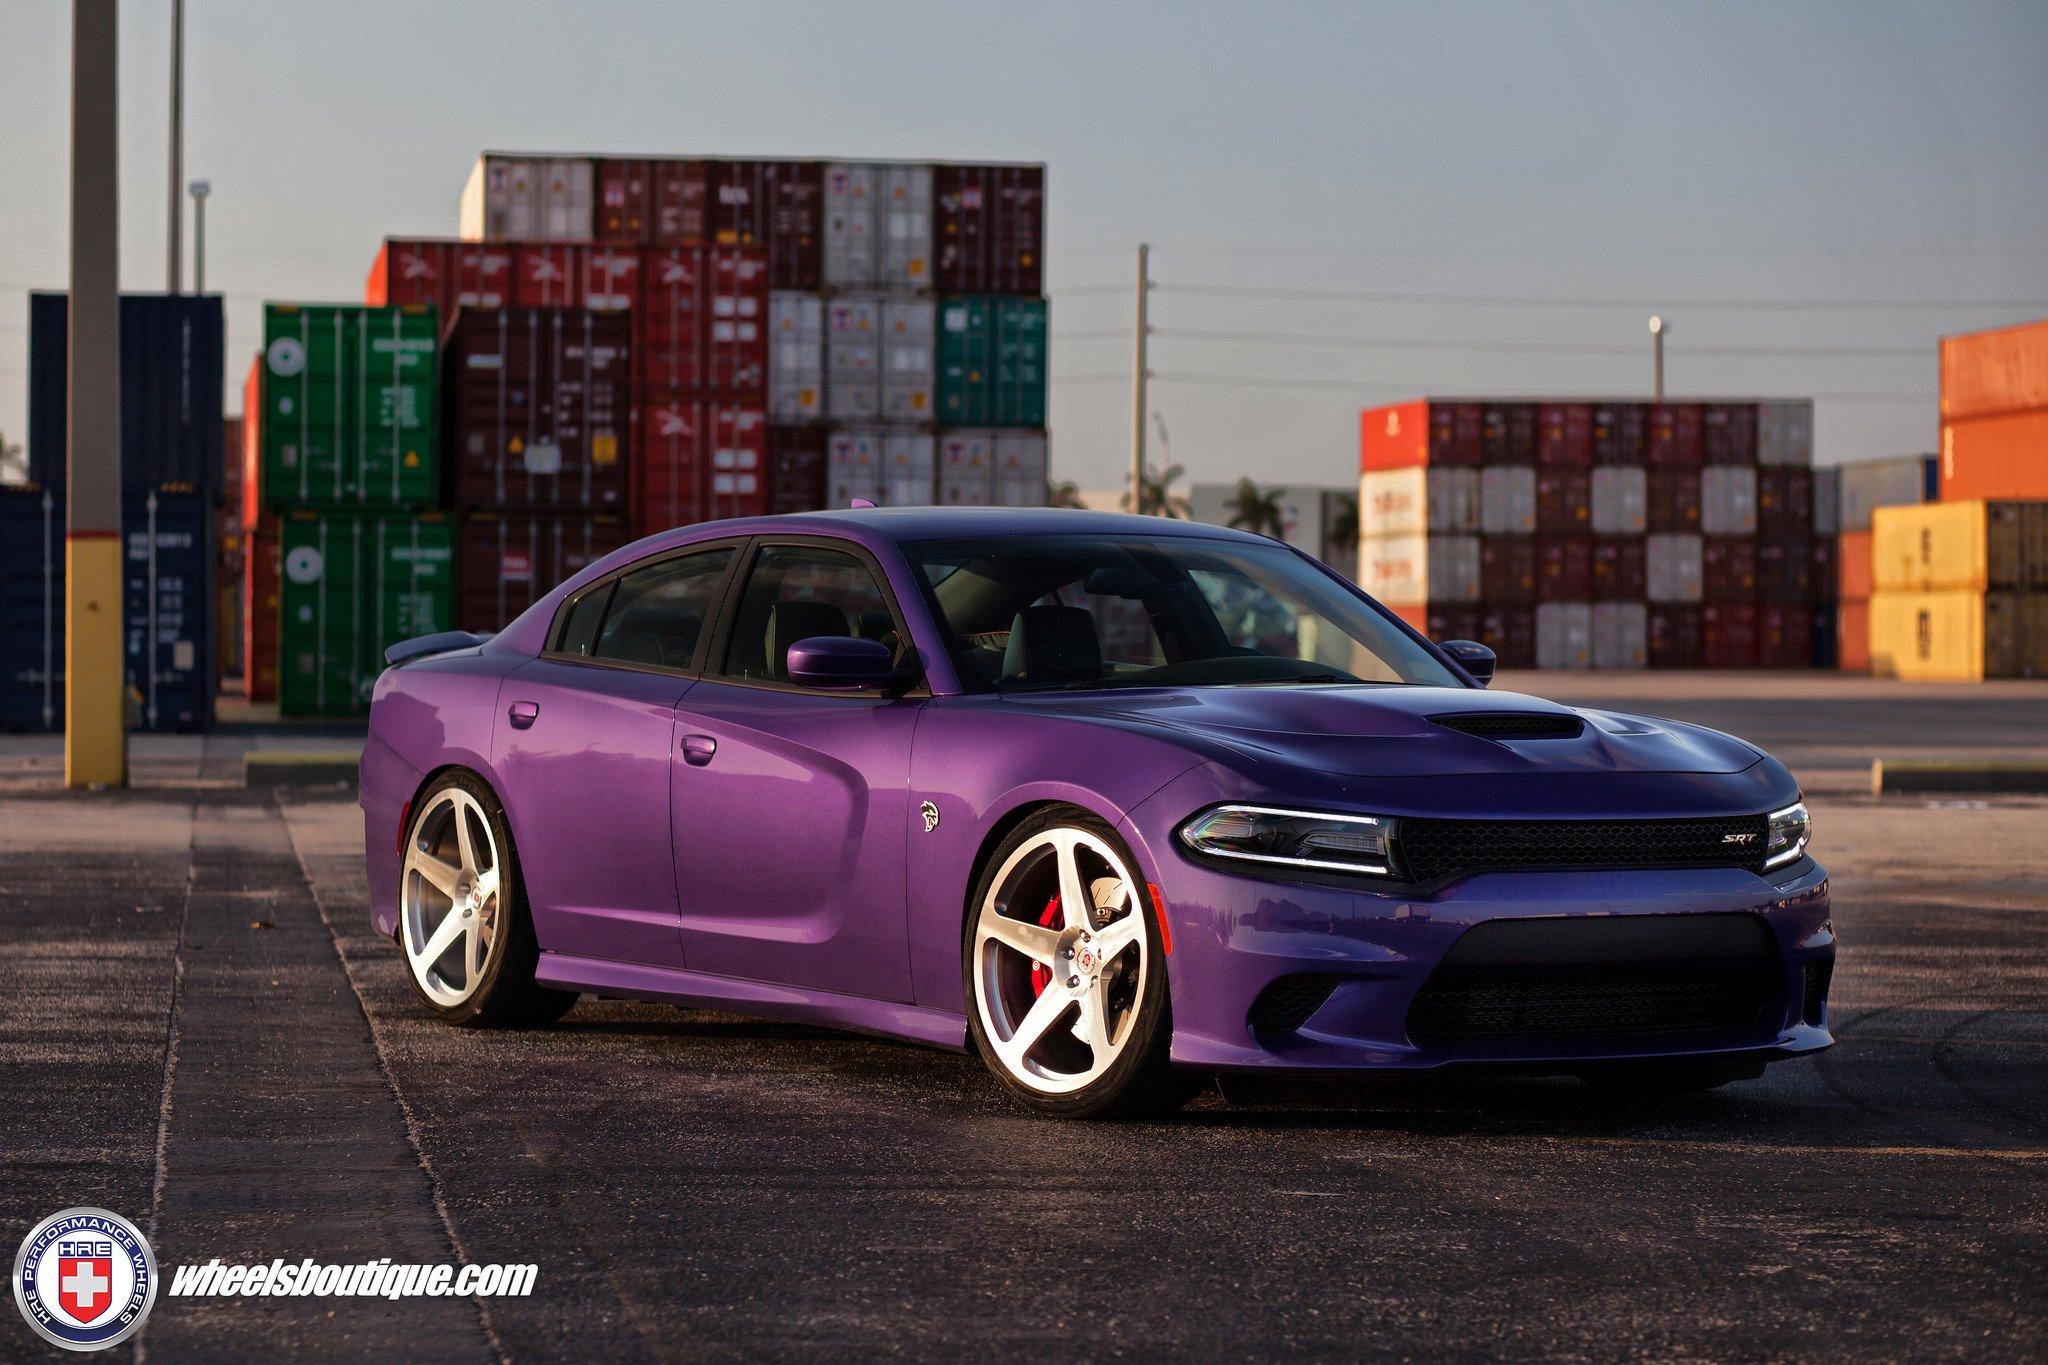 Dodge charger srt hellcat cars hre wheels wallpaper - Charger srt wallpaper ...